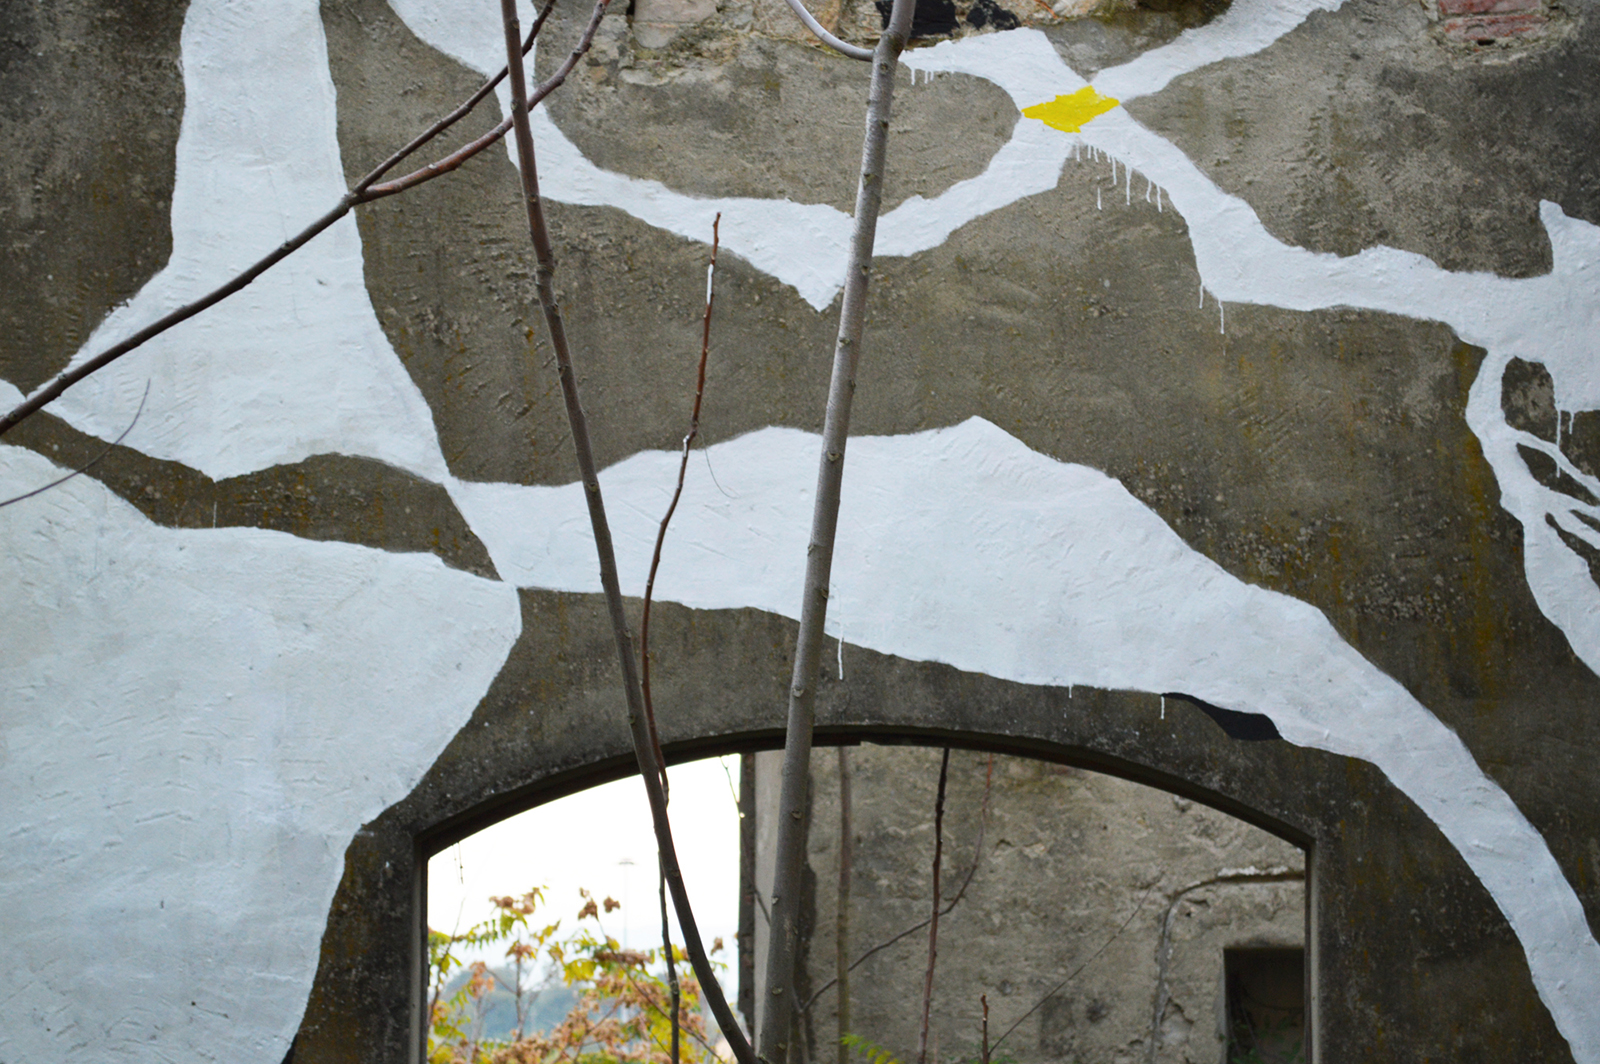 moallaseconda-new-mural-in-prato-02